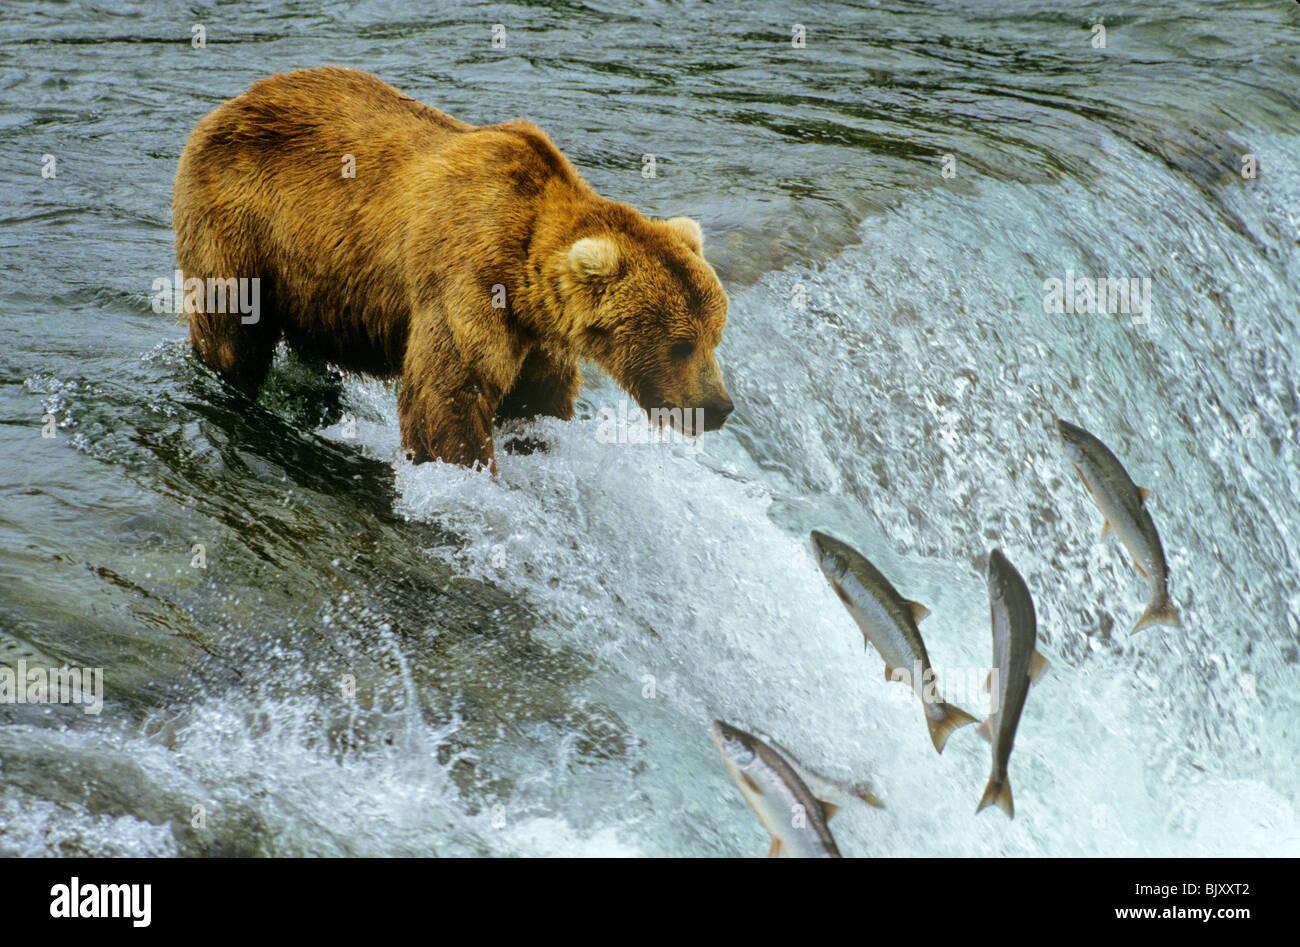 Alaska Brown Bear la pesca del salmón en Brooks Brooks recae sobre el río en el Parque Nacional de Katmai, Imagen De Stock